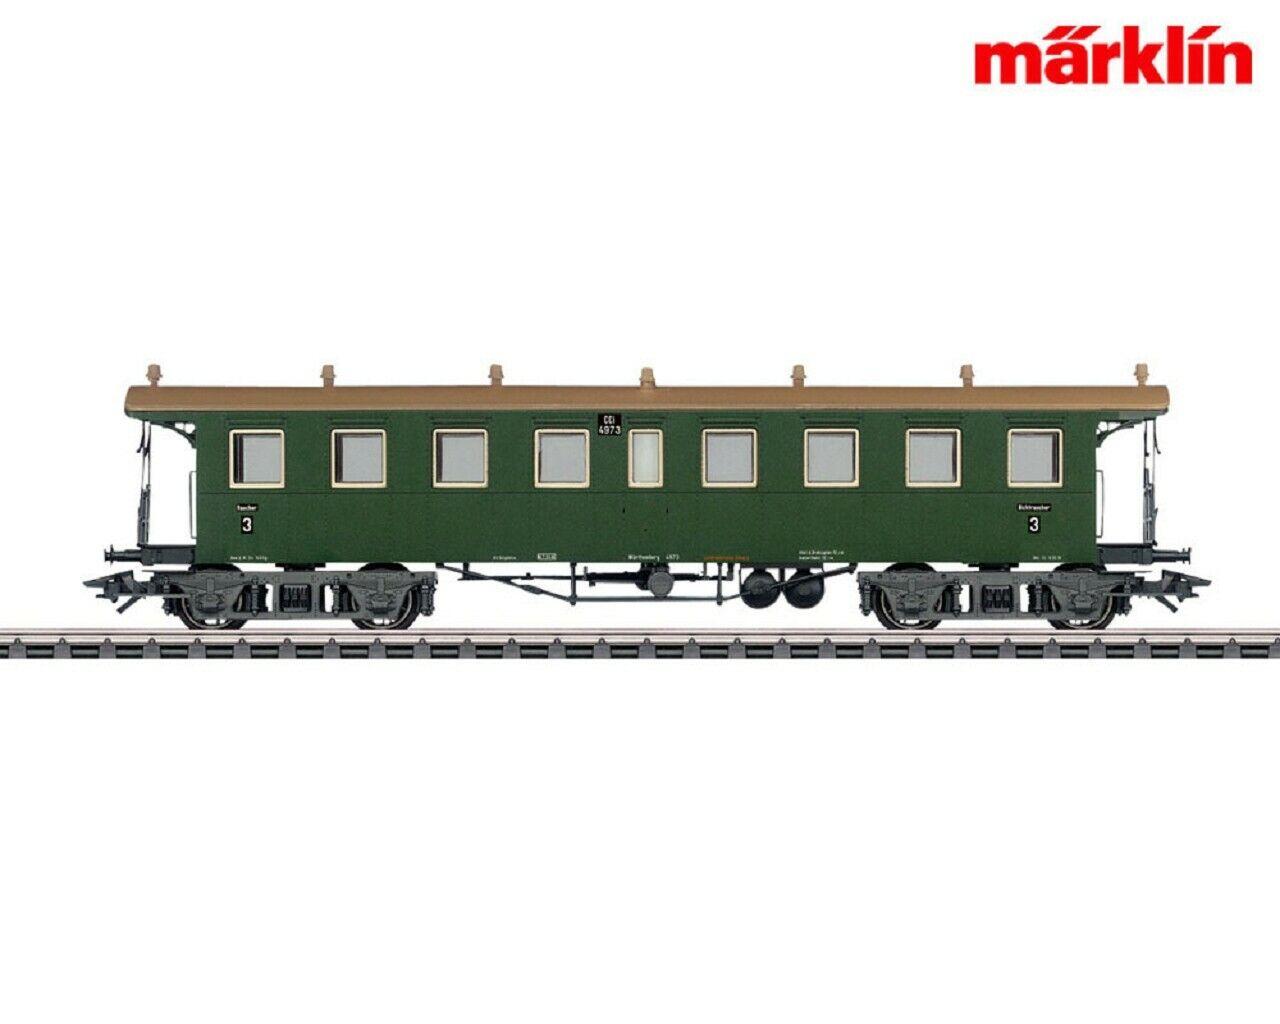 Märklin 42132 Sitzwagen 3.Klasse K.W.St.E.  NEU in OVP  | Exzellente Verarbeitung